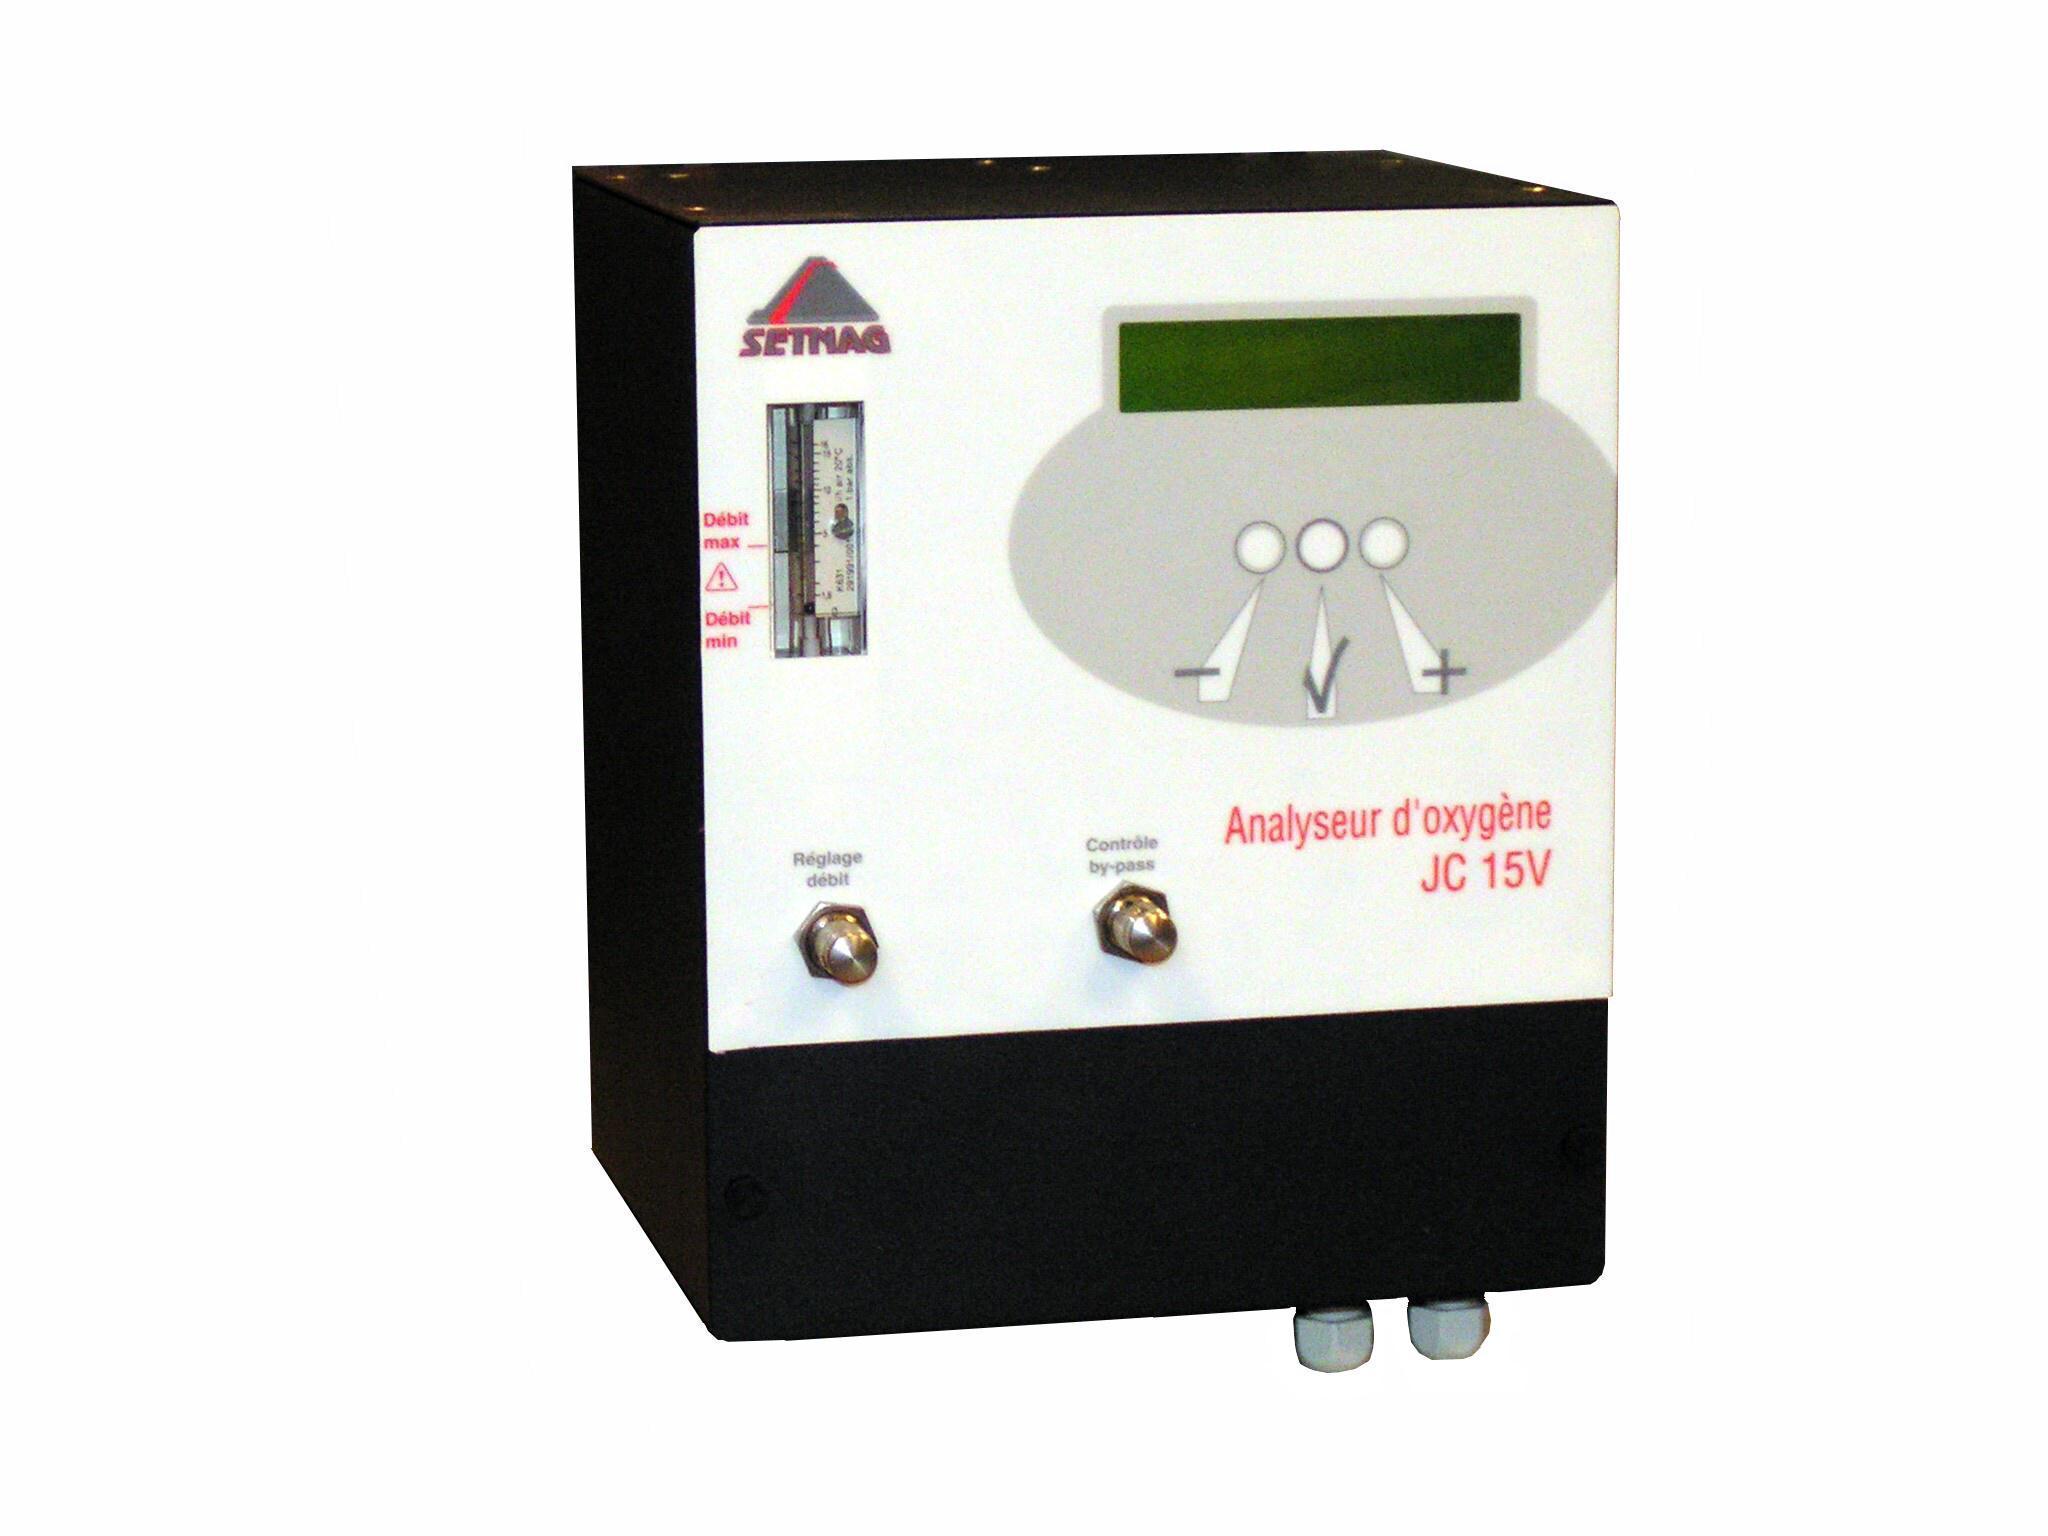 Analyseur d'oxygene jc15v